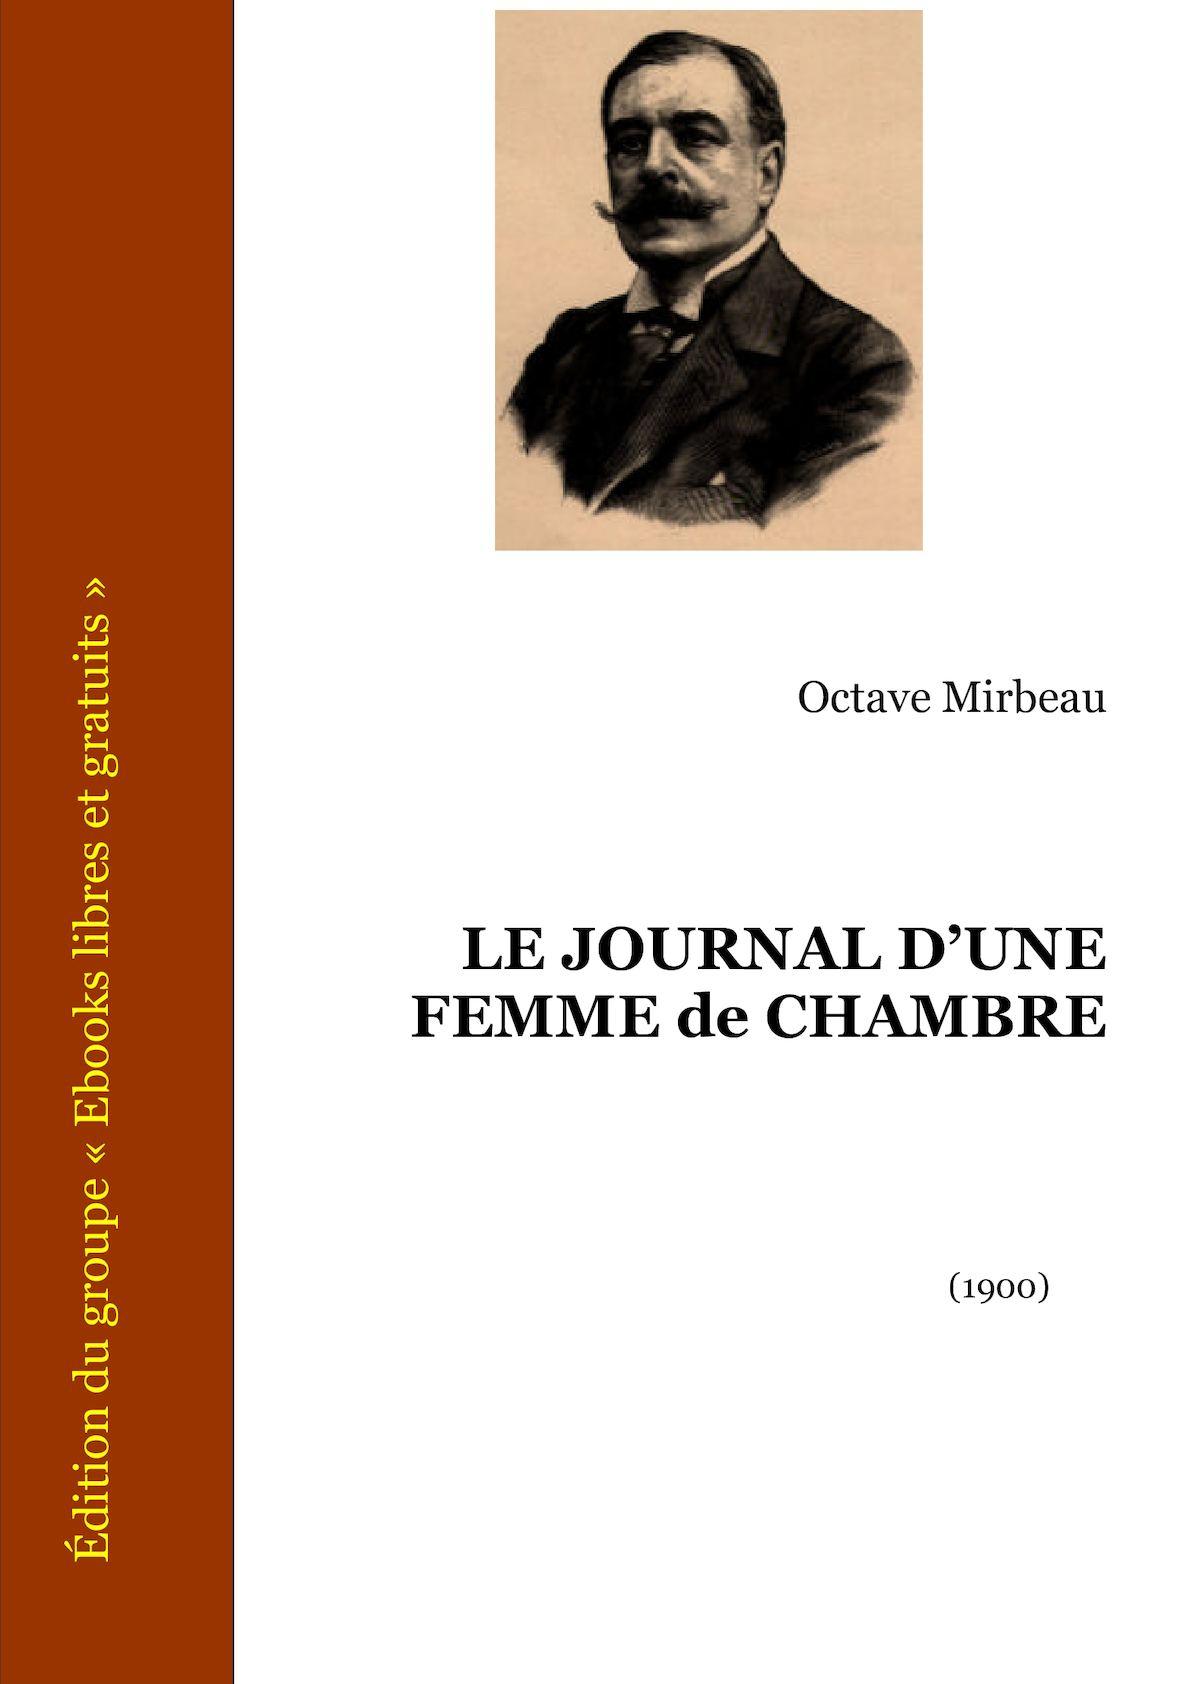 94ea3d4b60c172 Calaméo - Mirbeau Journal Femme De Chambre